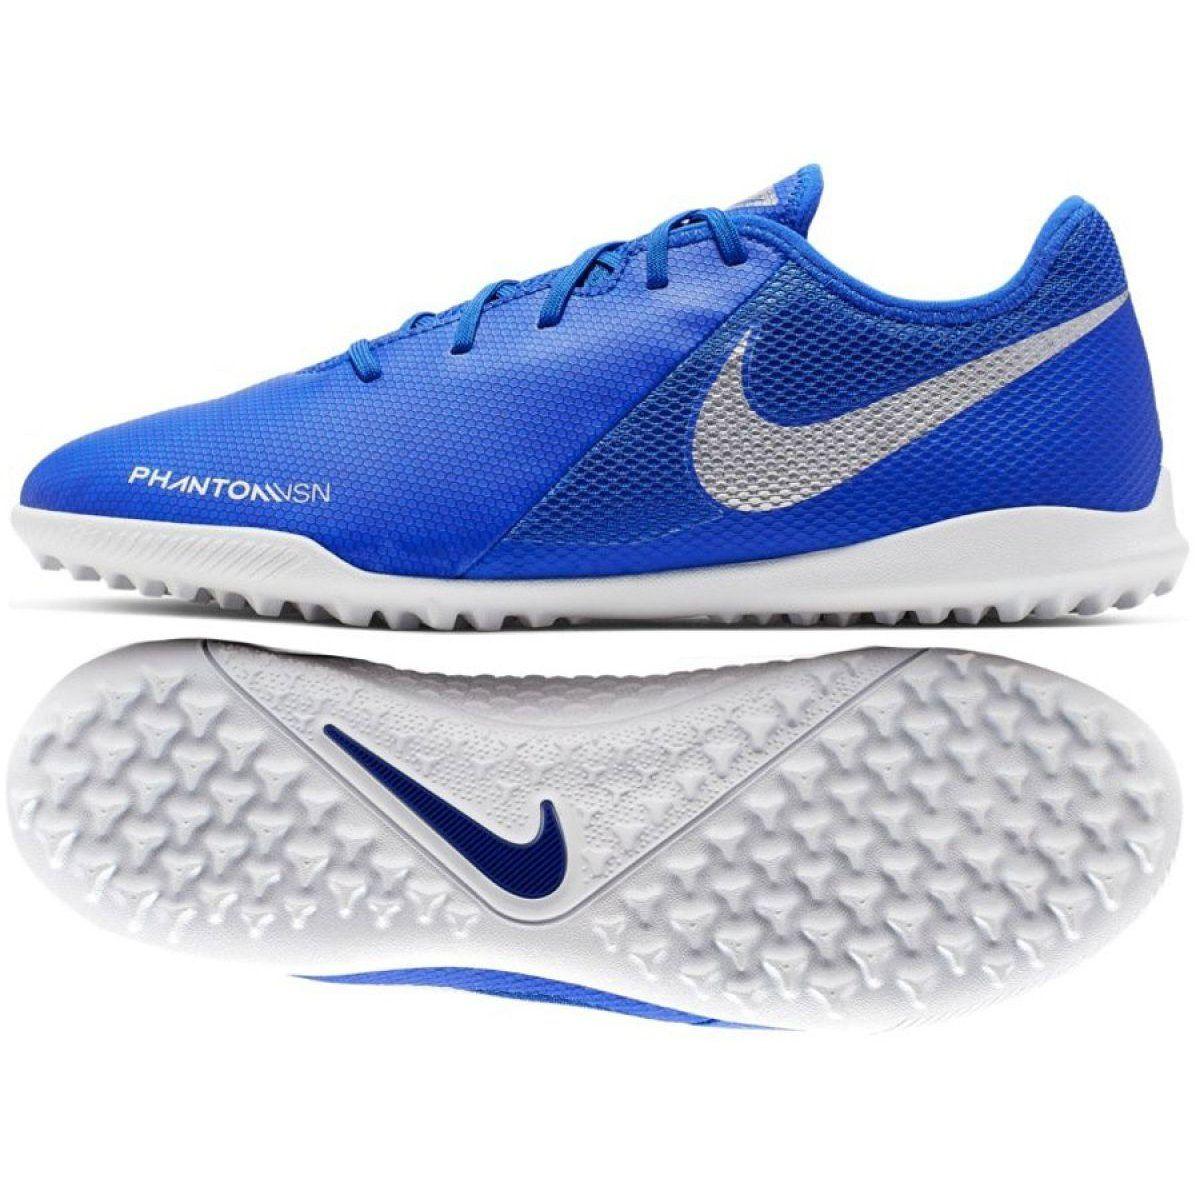 Buty Pilkarskie Nike Phantom Vsn Academy Tf M Ao3223 410 Niebieskie Wielokolorowe Nike Football Shoes Nike Shoes